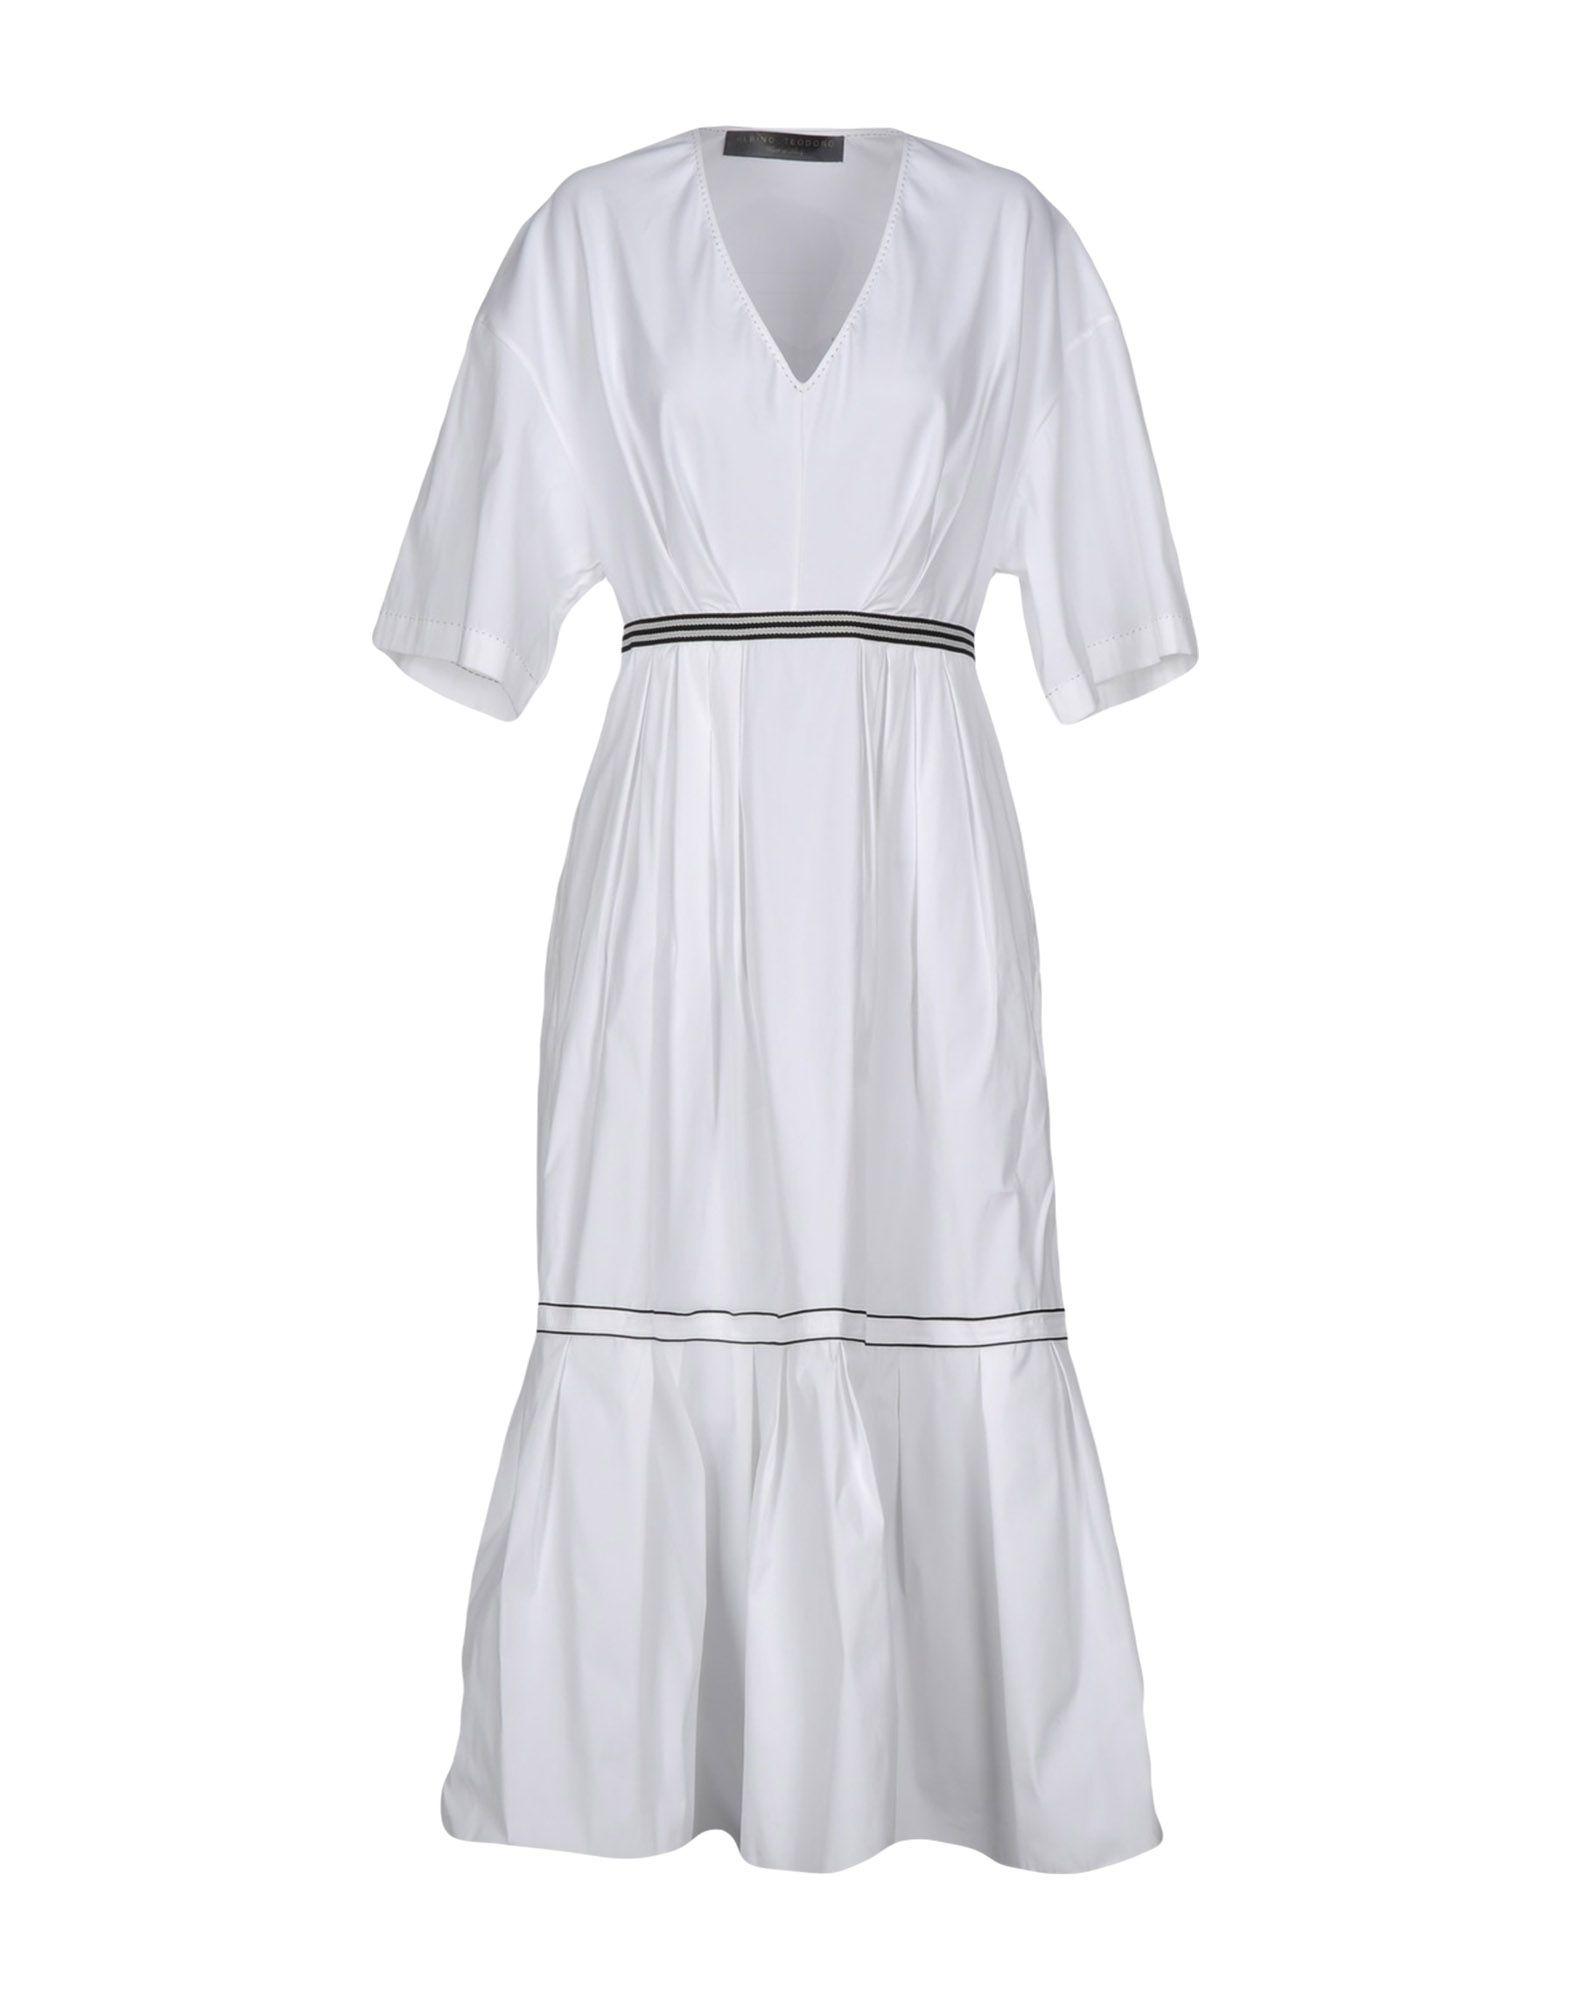 ALBINO TEODORO Платье длиной 3/4 lisa corti платье длиной 3 4